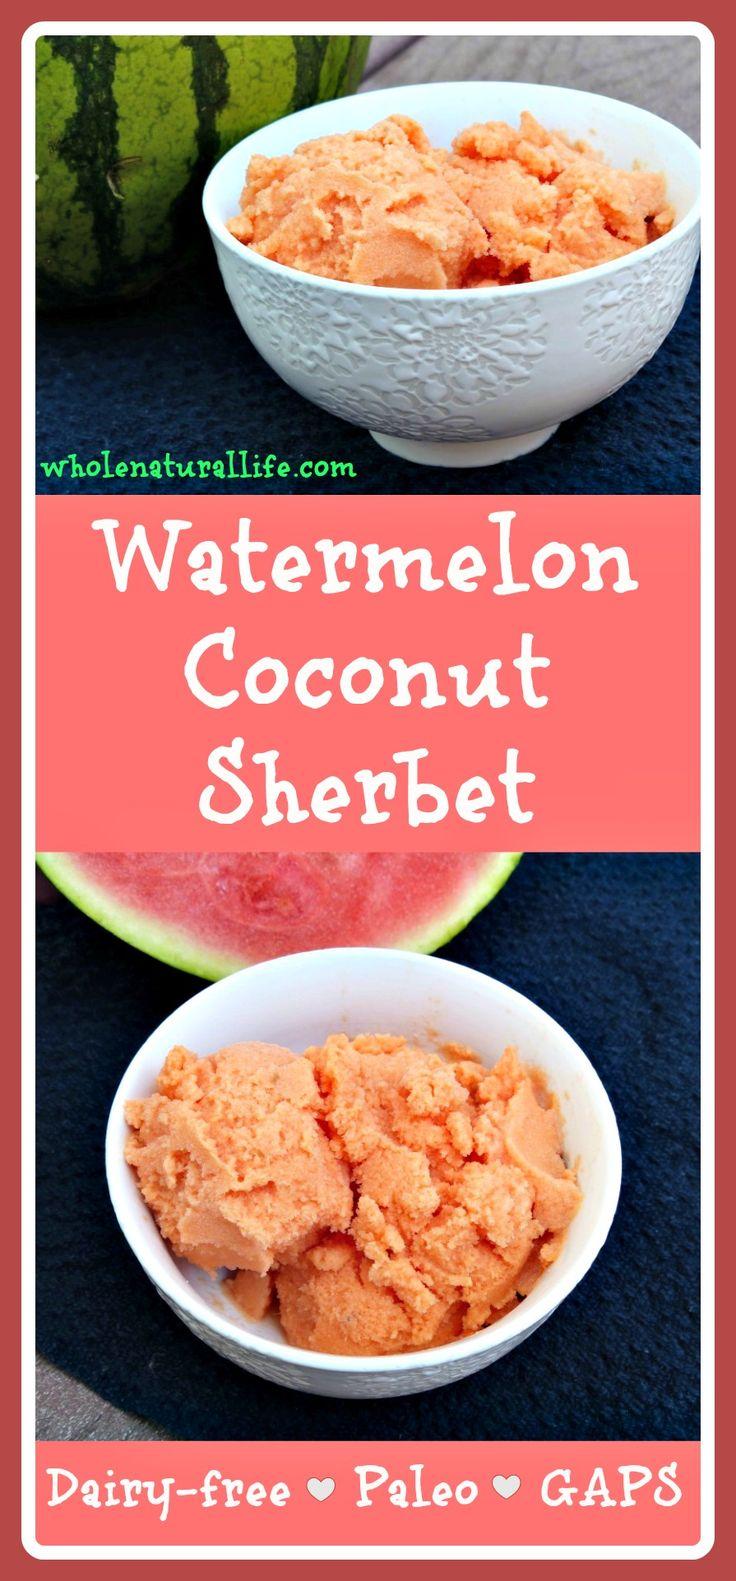 Watermelon Coconut Sherbet: Dairy-free, GAPS and Paleo